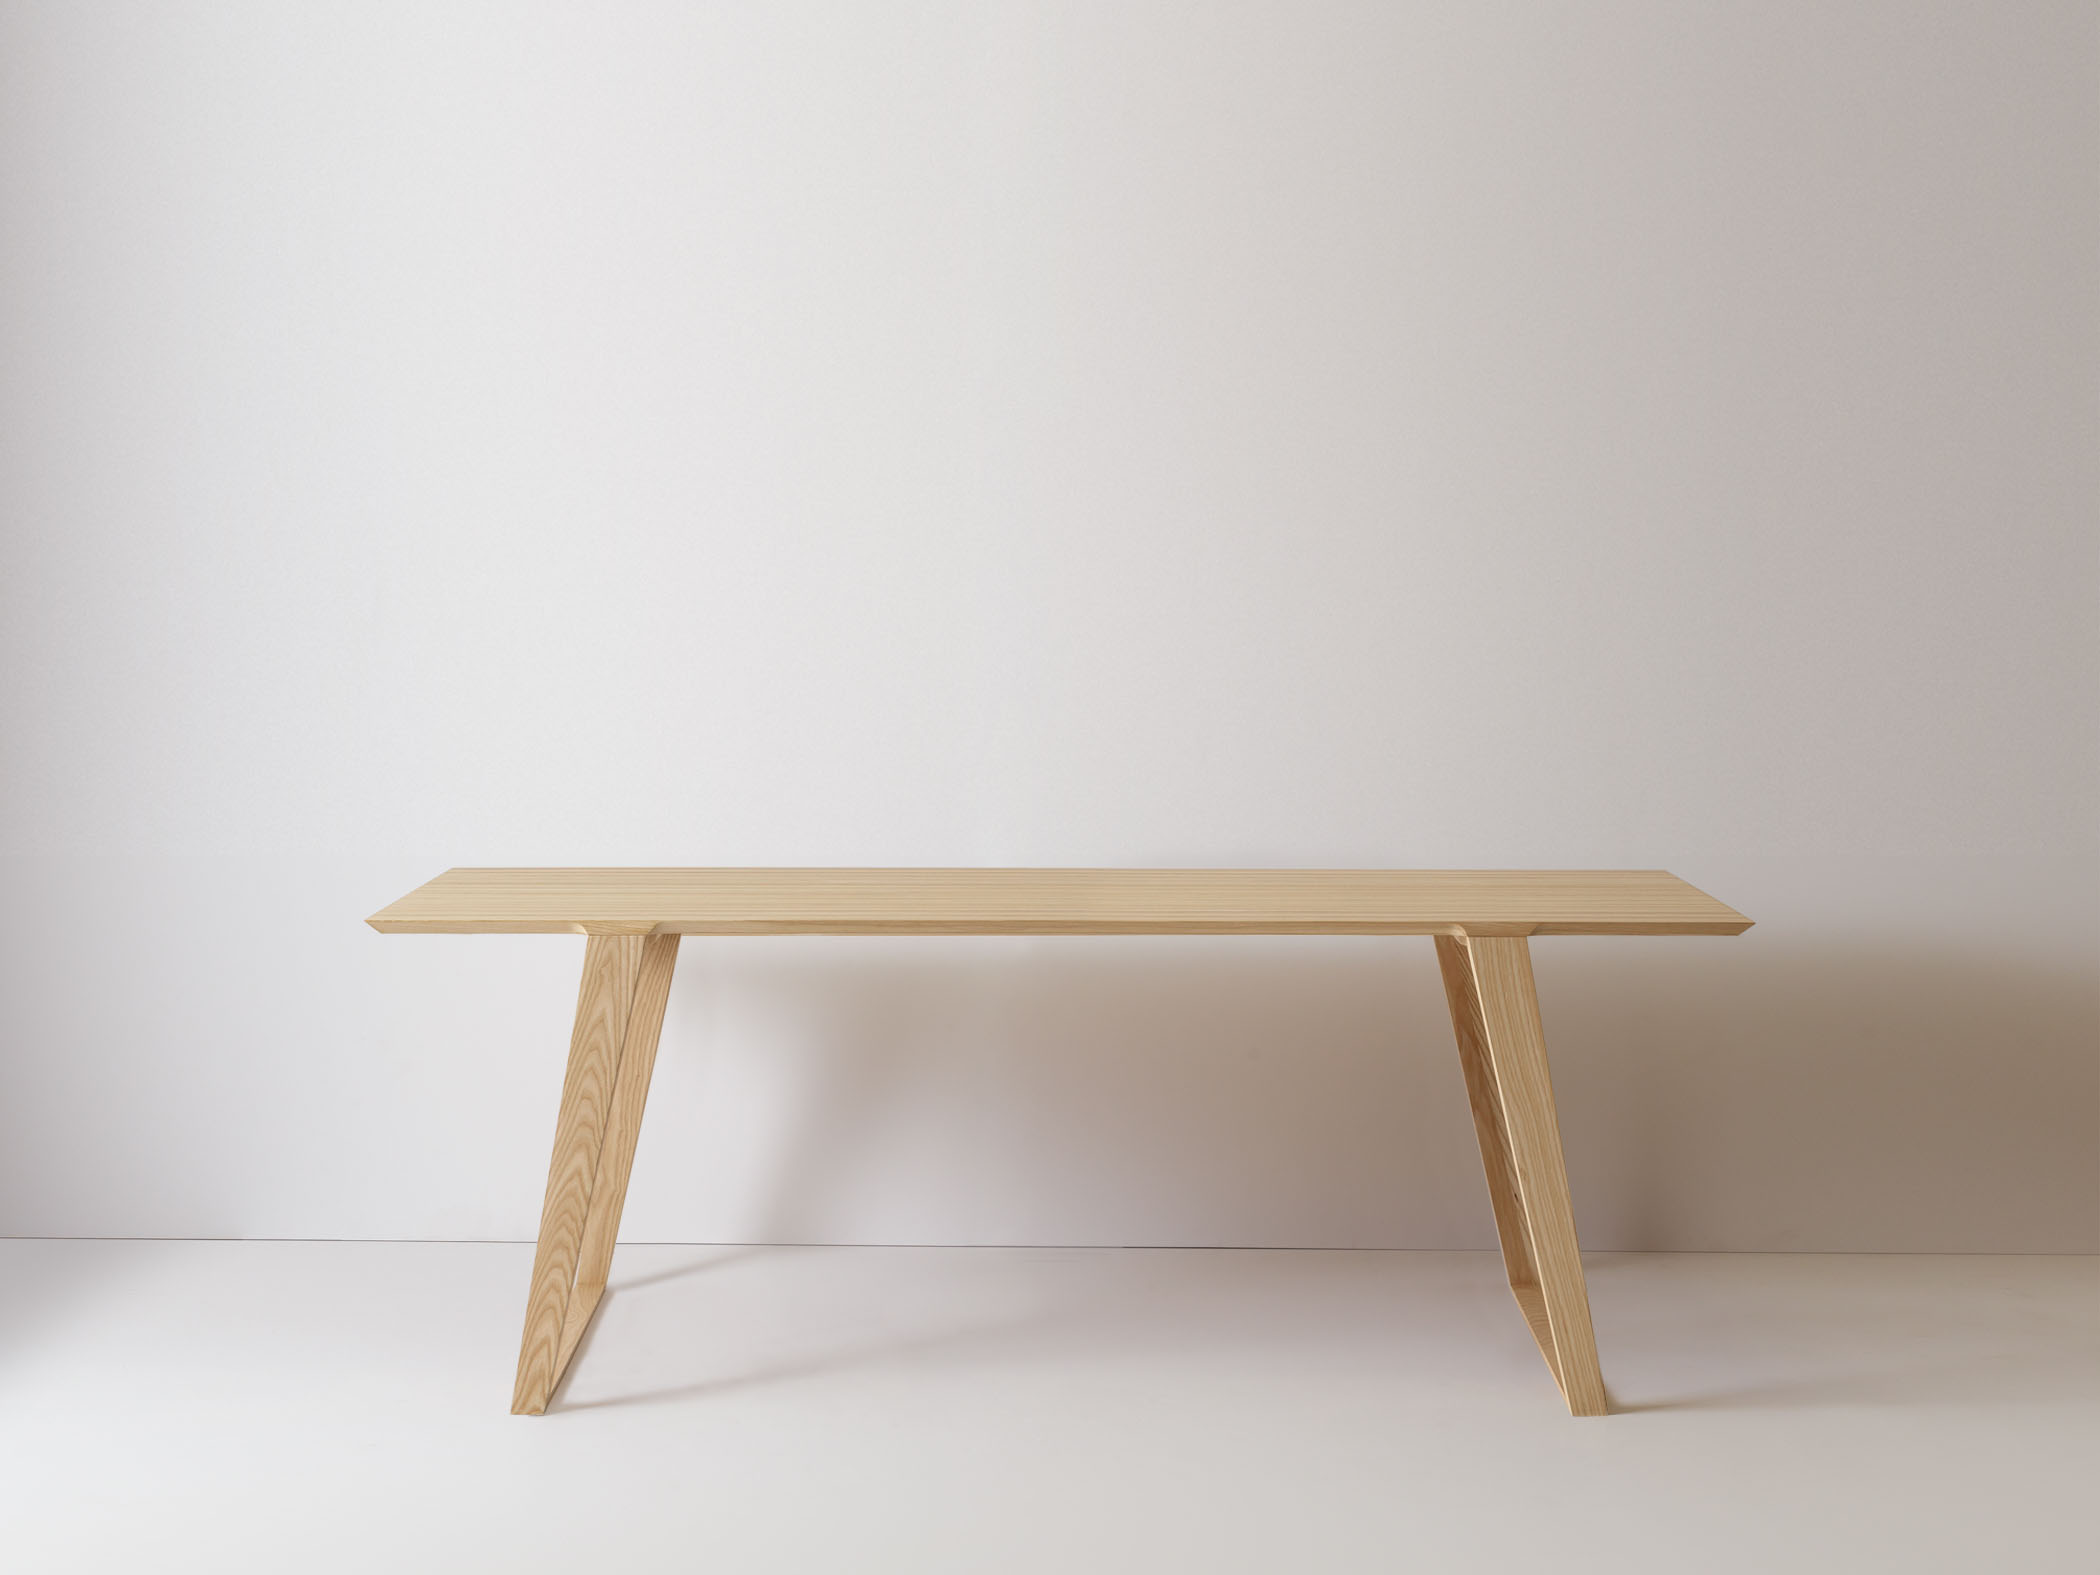 Medium Isometric Table in Ash